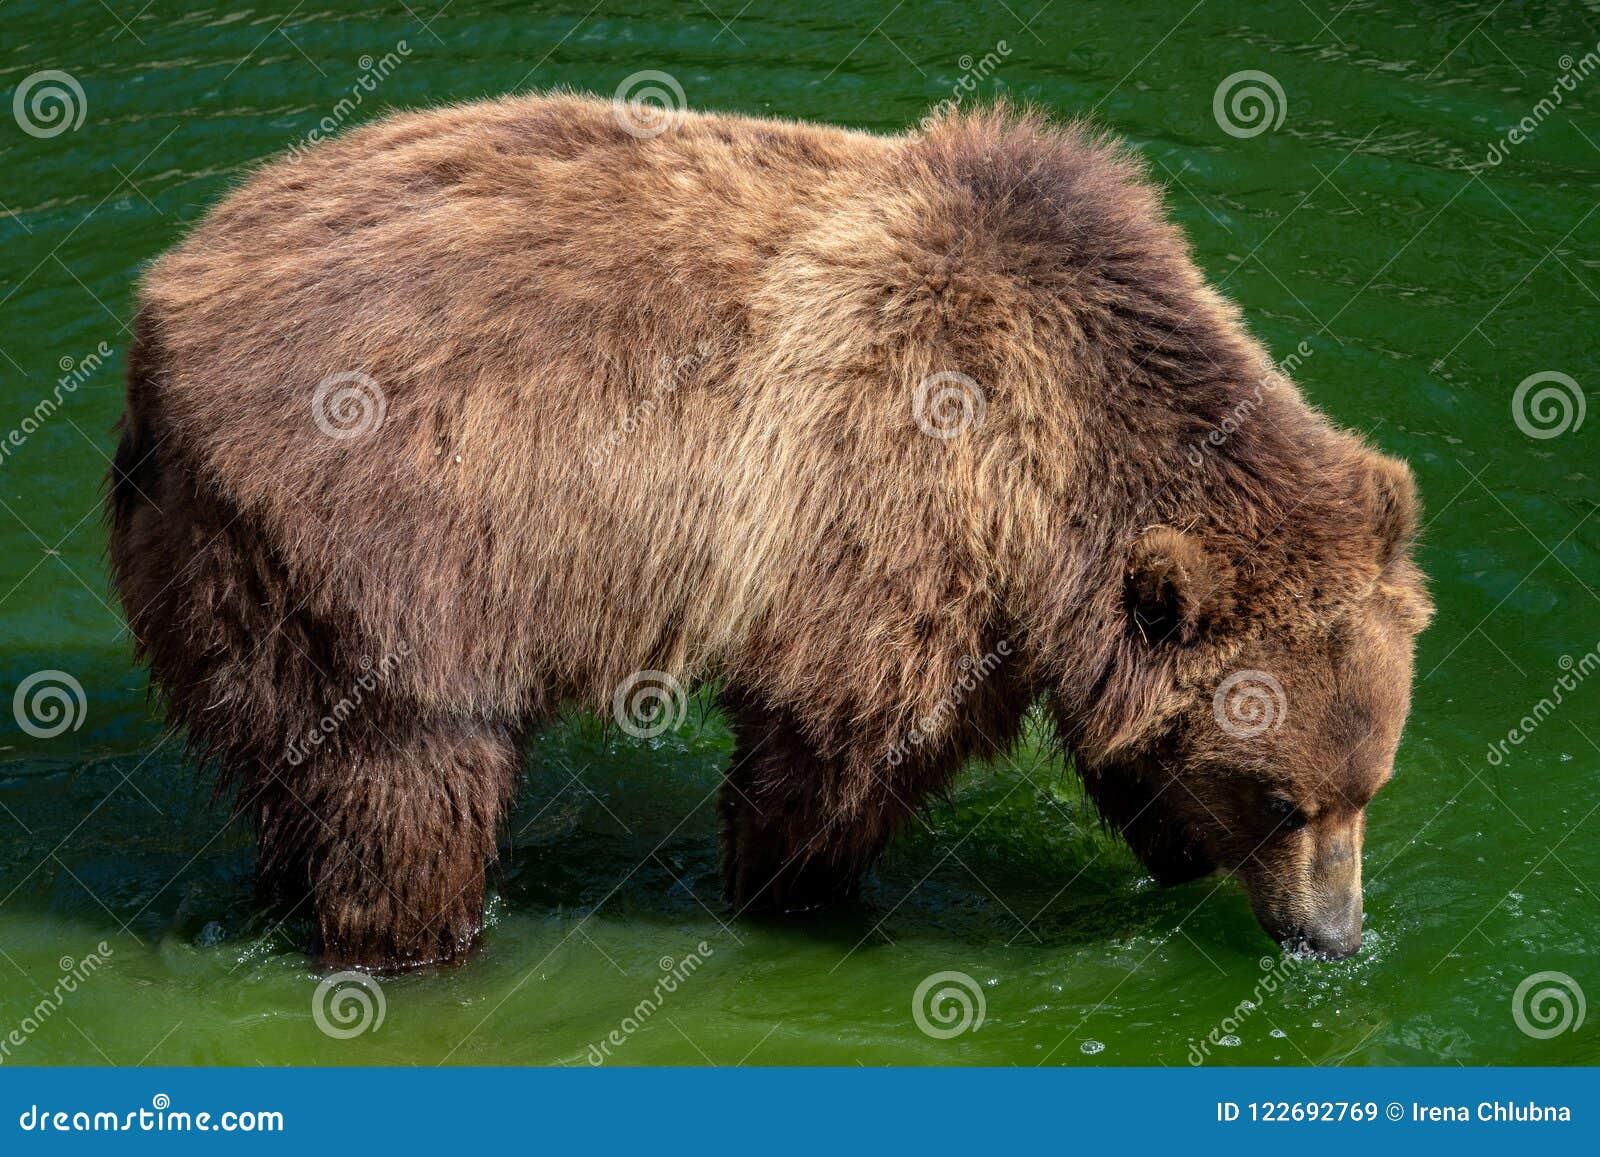 Brown-Bär im Wasser Porträt von Braunbär Ursus arctos beringianus